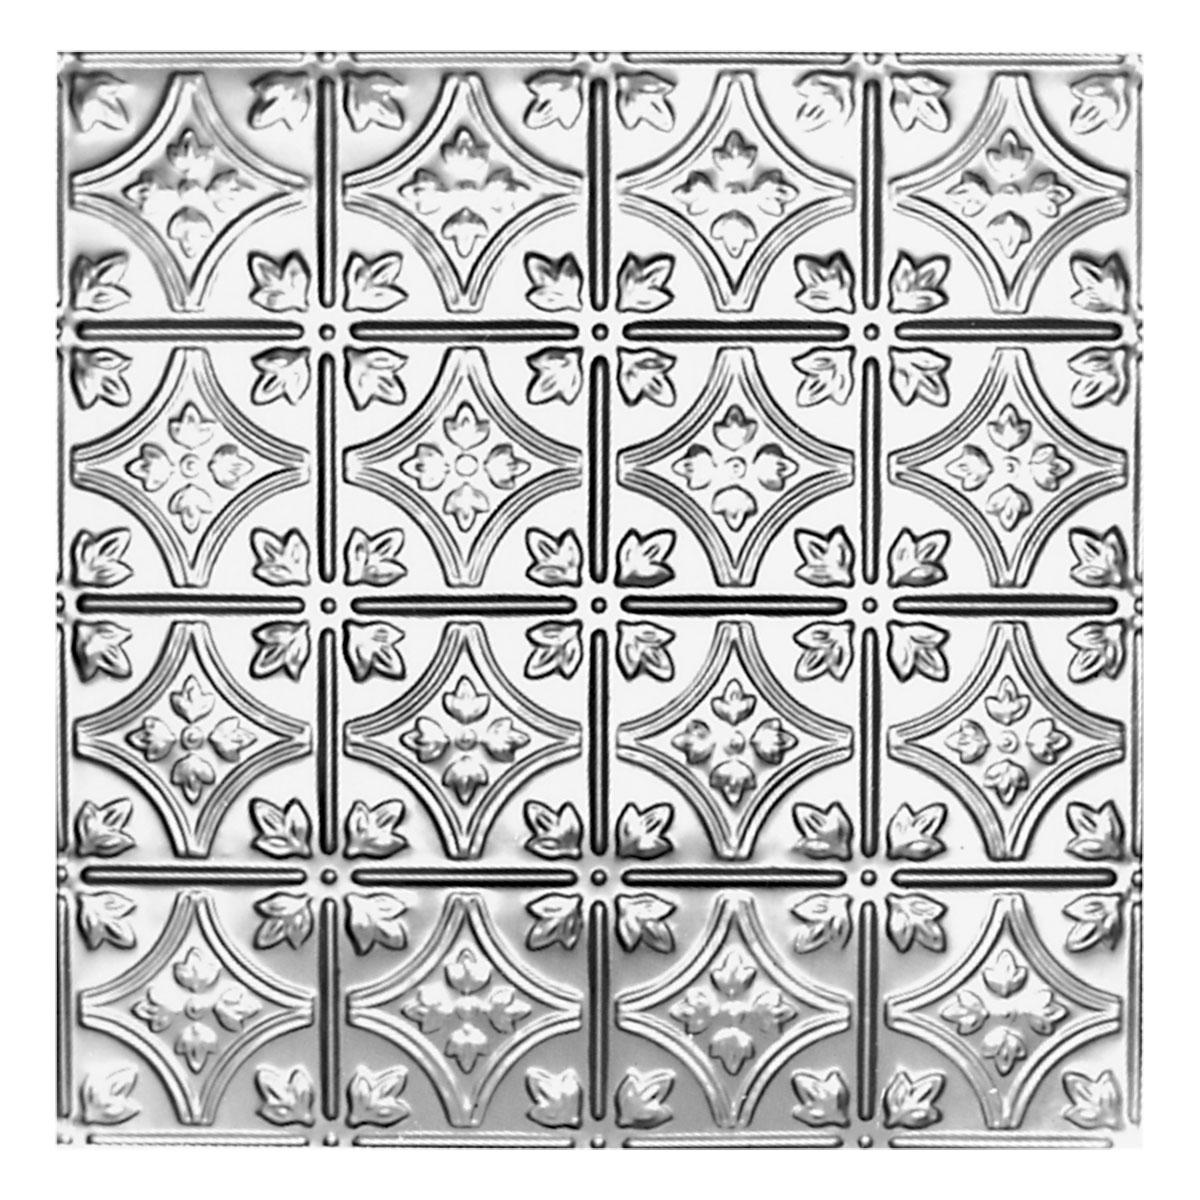 Ceiling tilesg ceiling tile ideas decorative ceiling tiles post navigation dailygadgetfo Gallery